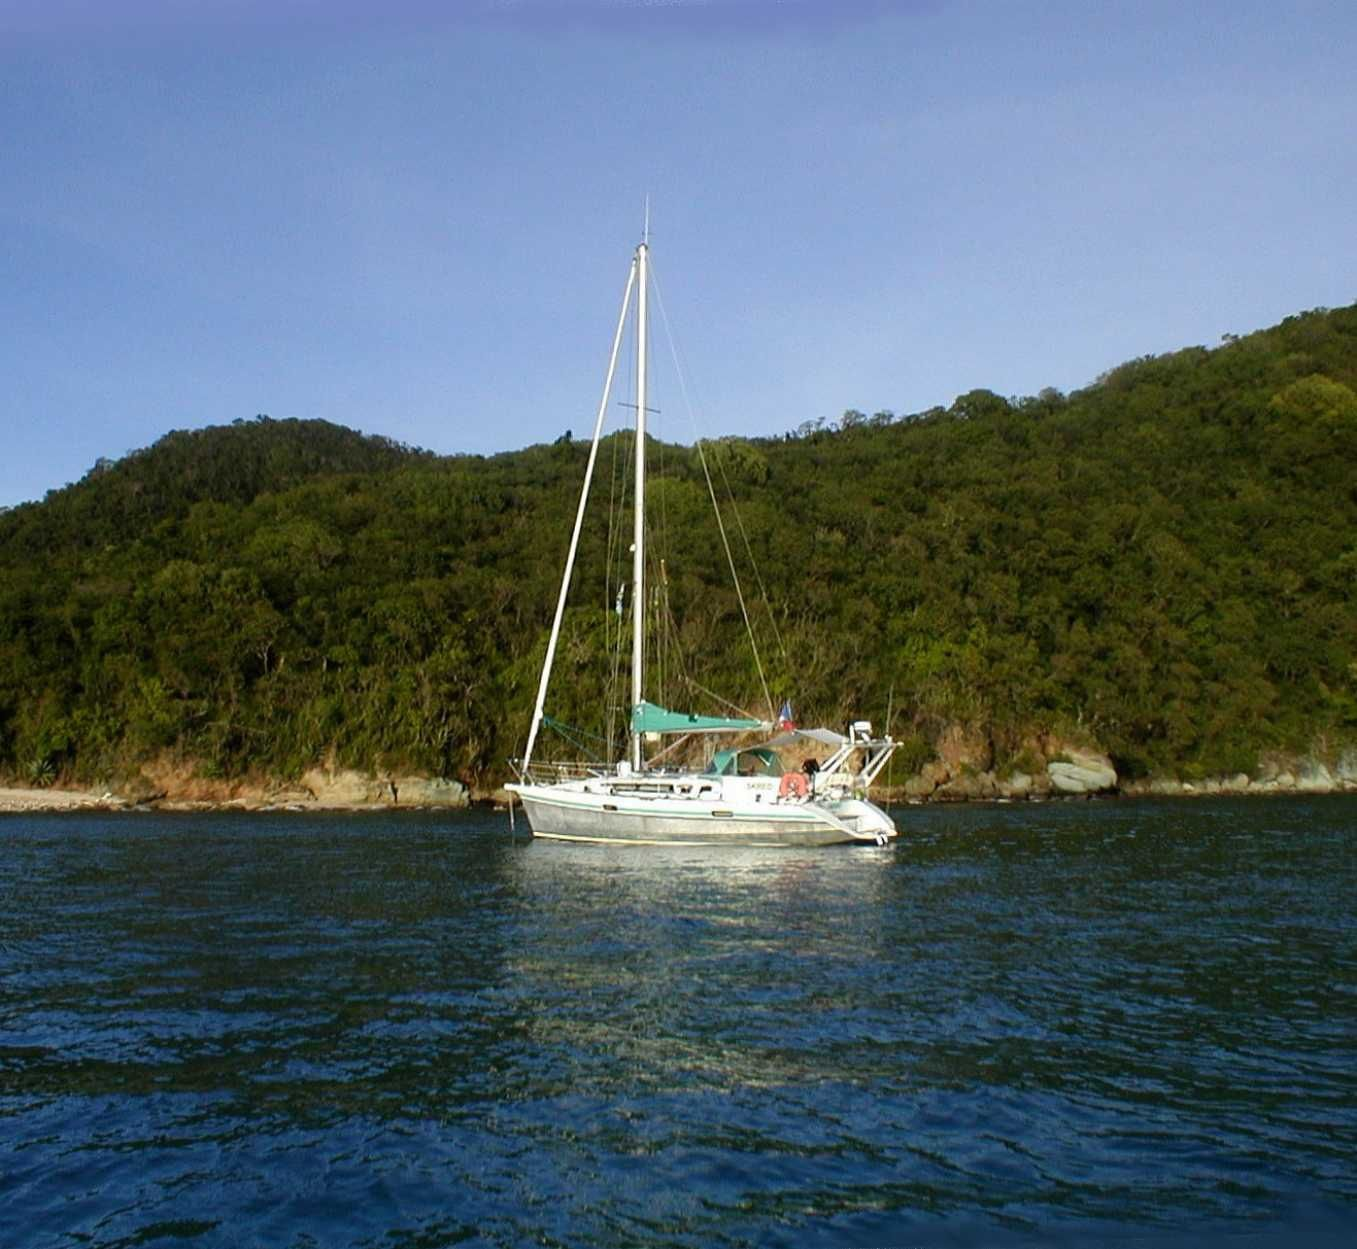 Skreo à Rameau Bay Canouan  Grenadines 2005